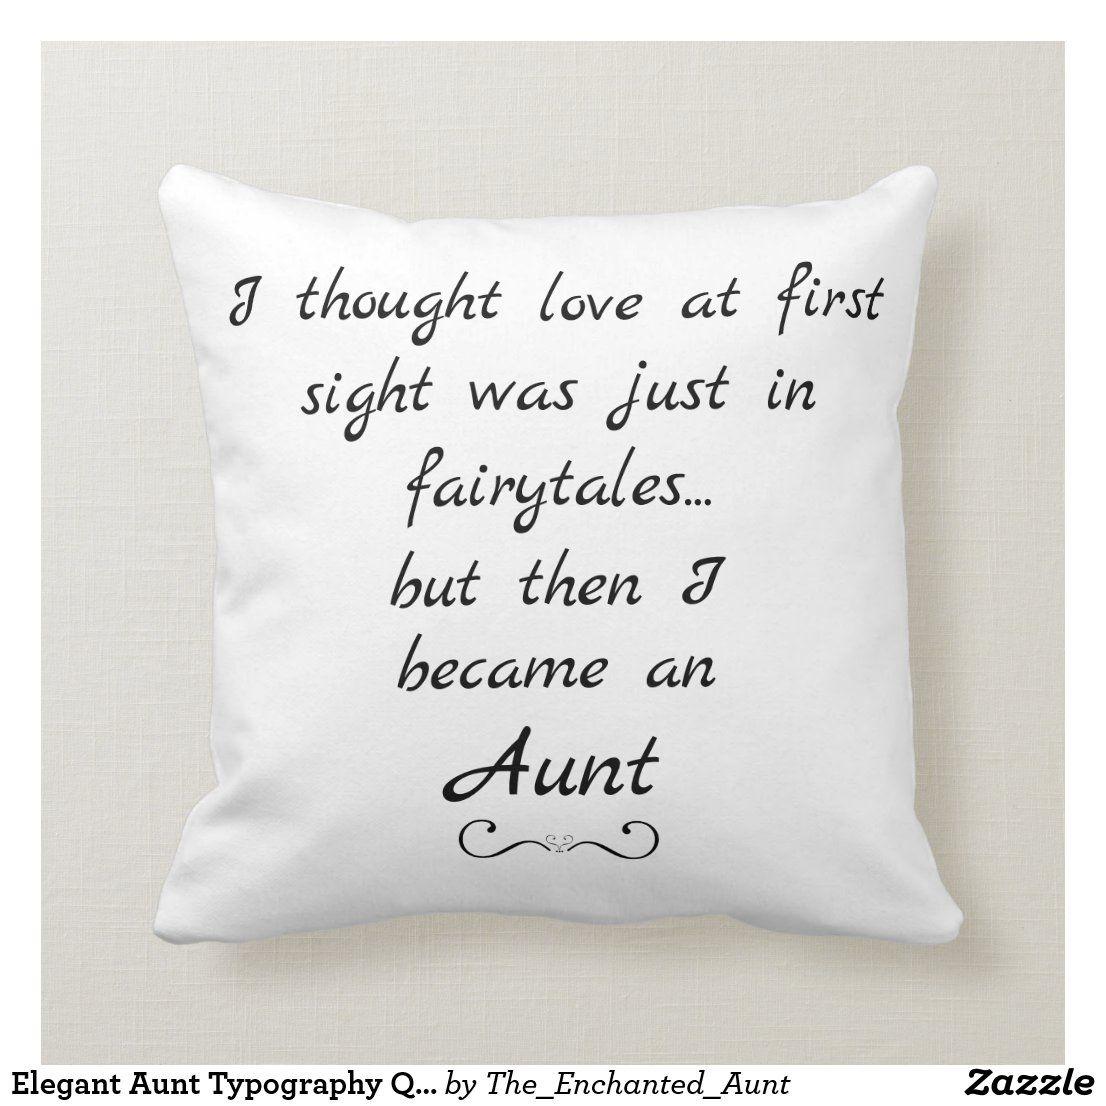 Elegant Aunt Typography Quote Throw Pillow  Zazzle.com in 5